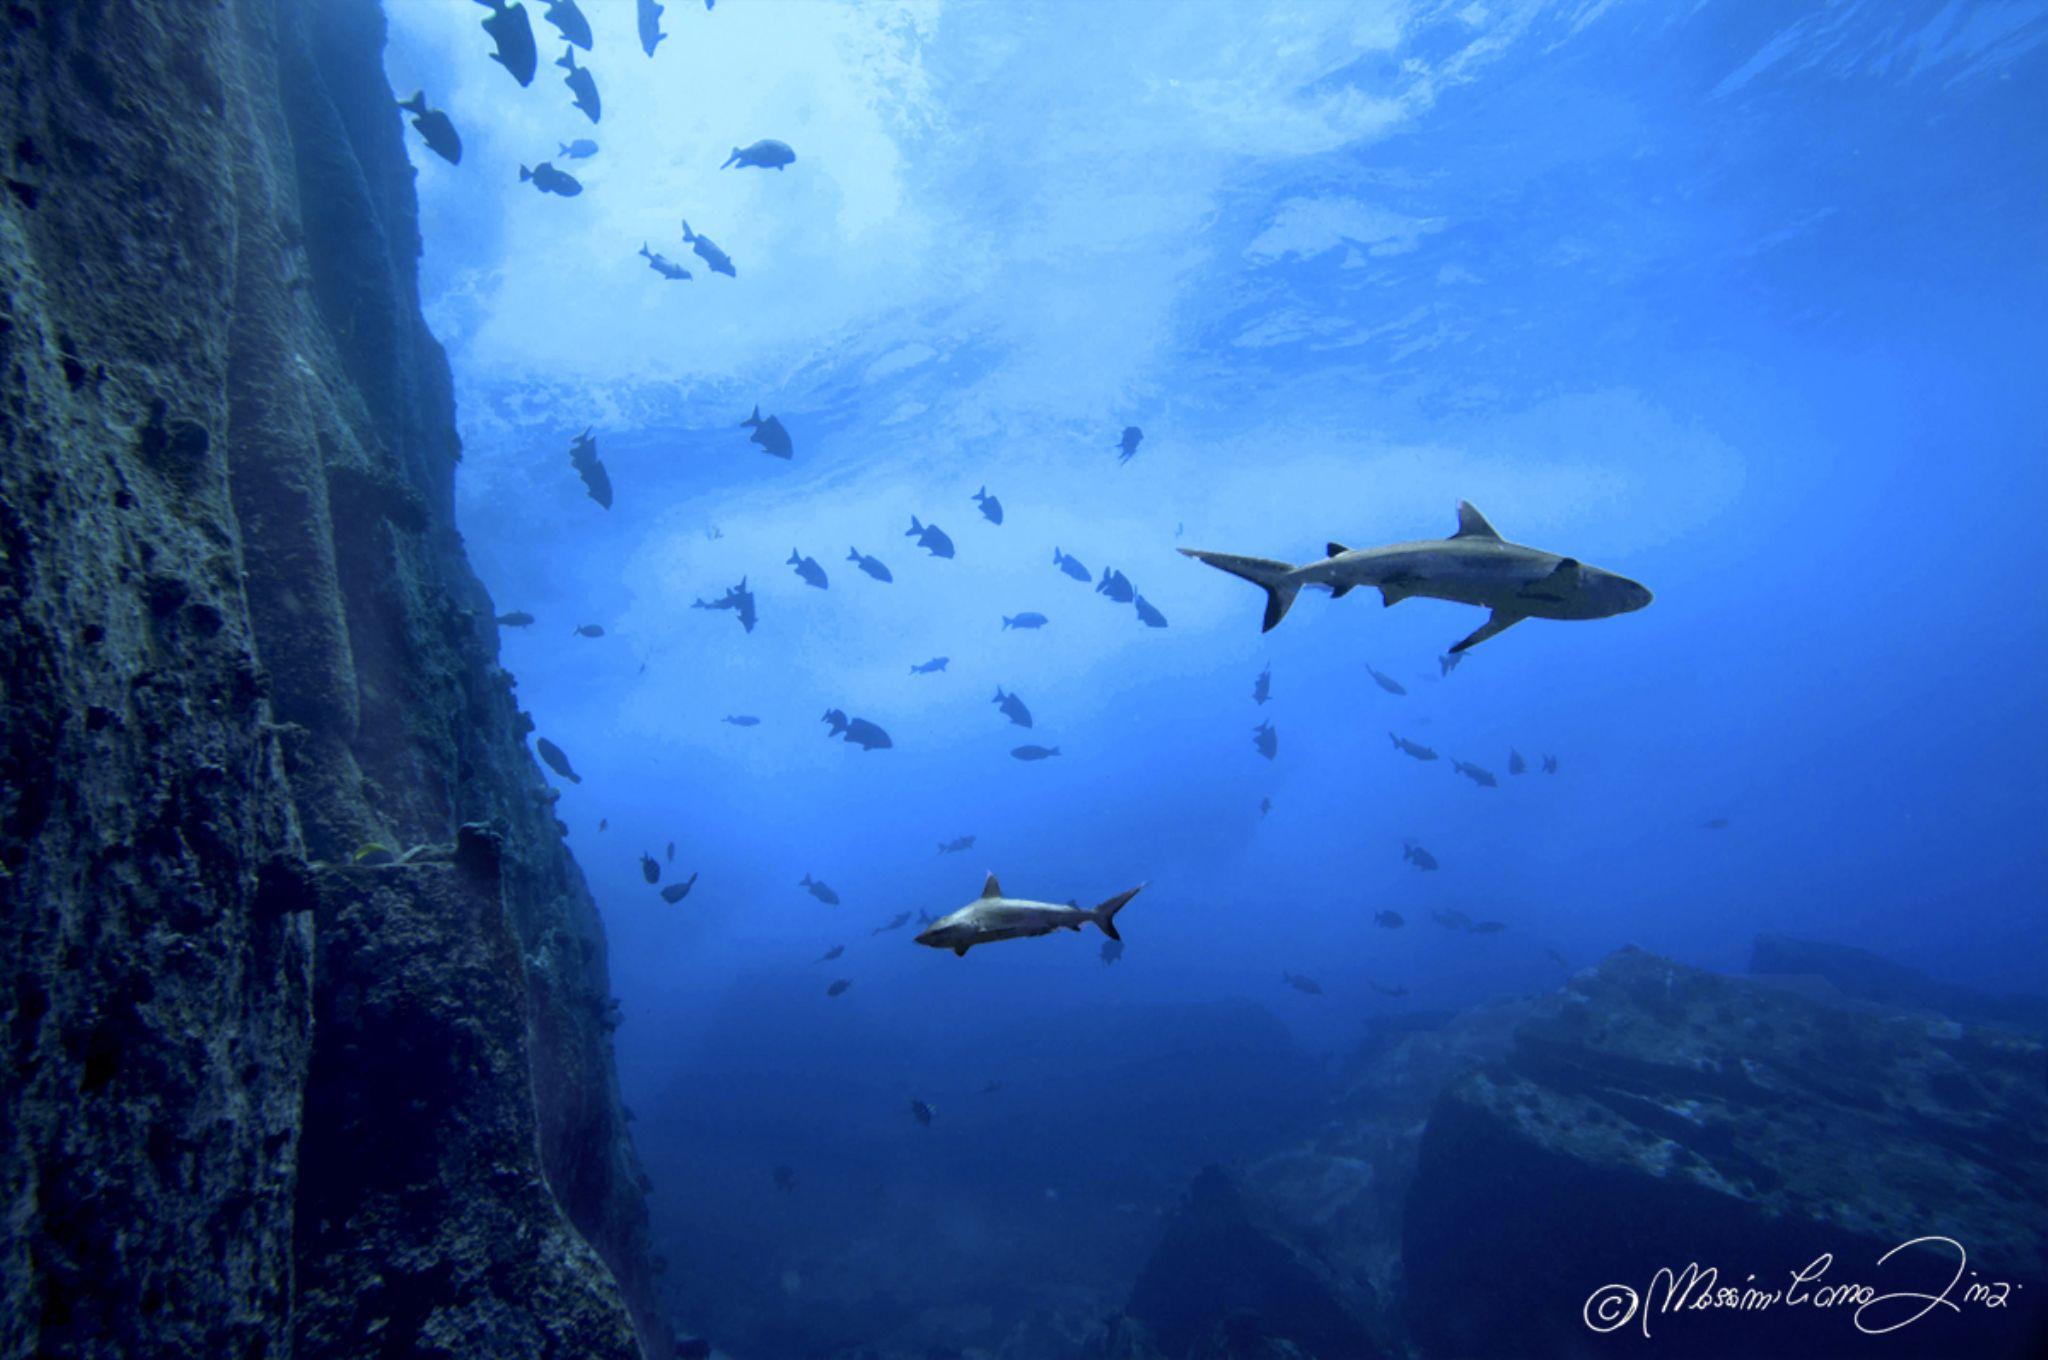 Shark Temple by massimiliano.finzi